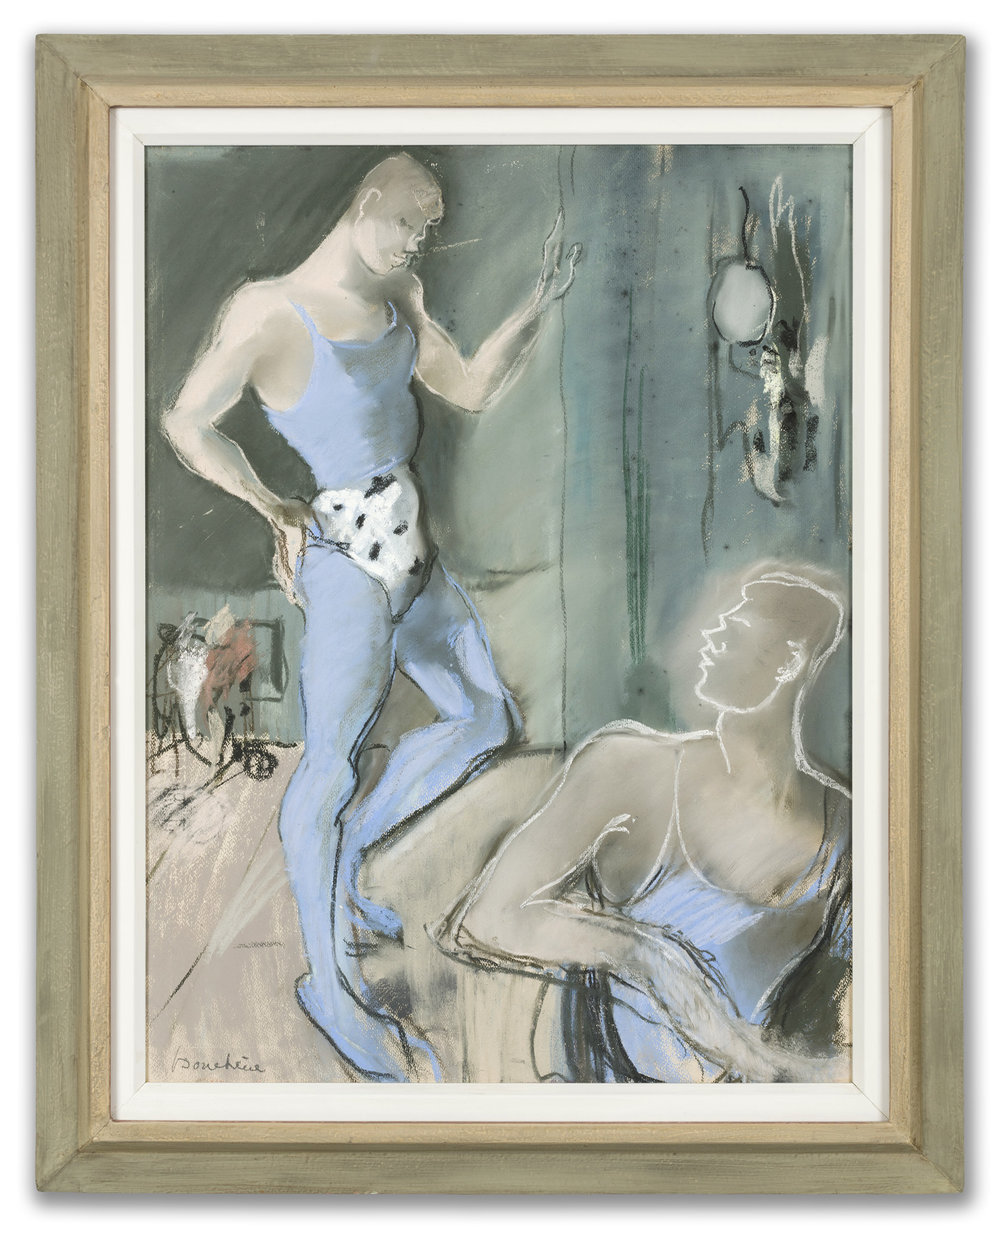 Dimitri Bouchéne, (Russian 1893-1993) Dans La Loge, c.1920s.